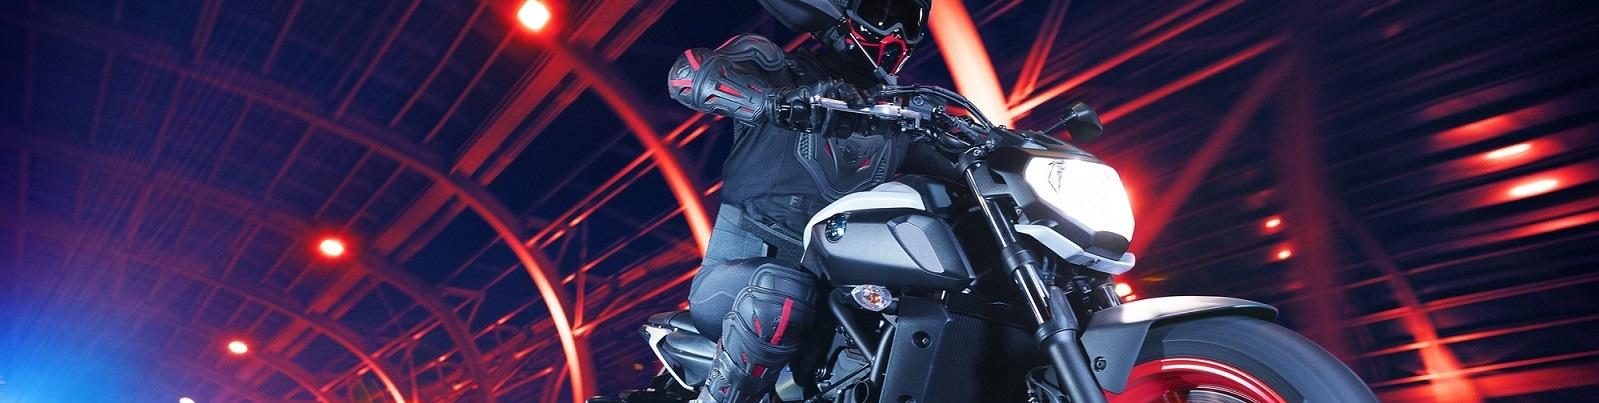 Yamaha MT-07 Ice Fluo - MotorCentrumWest